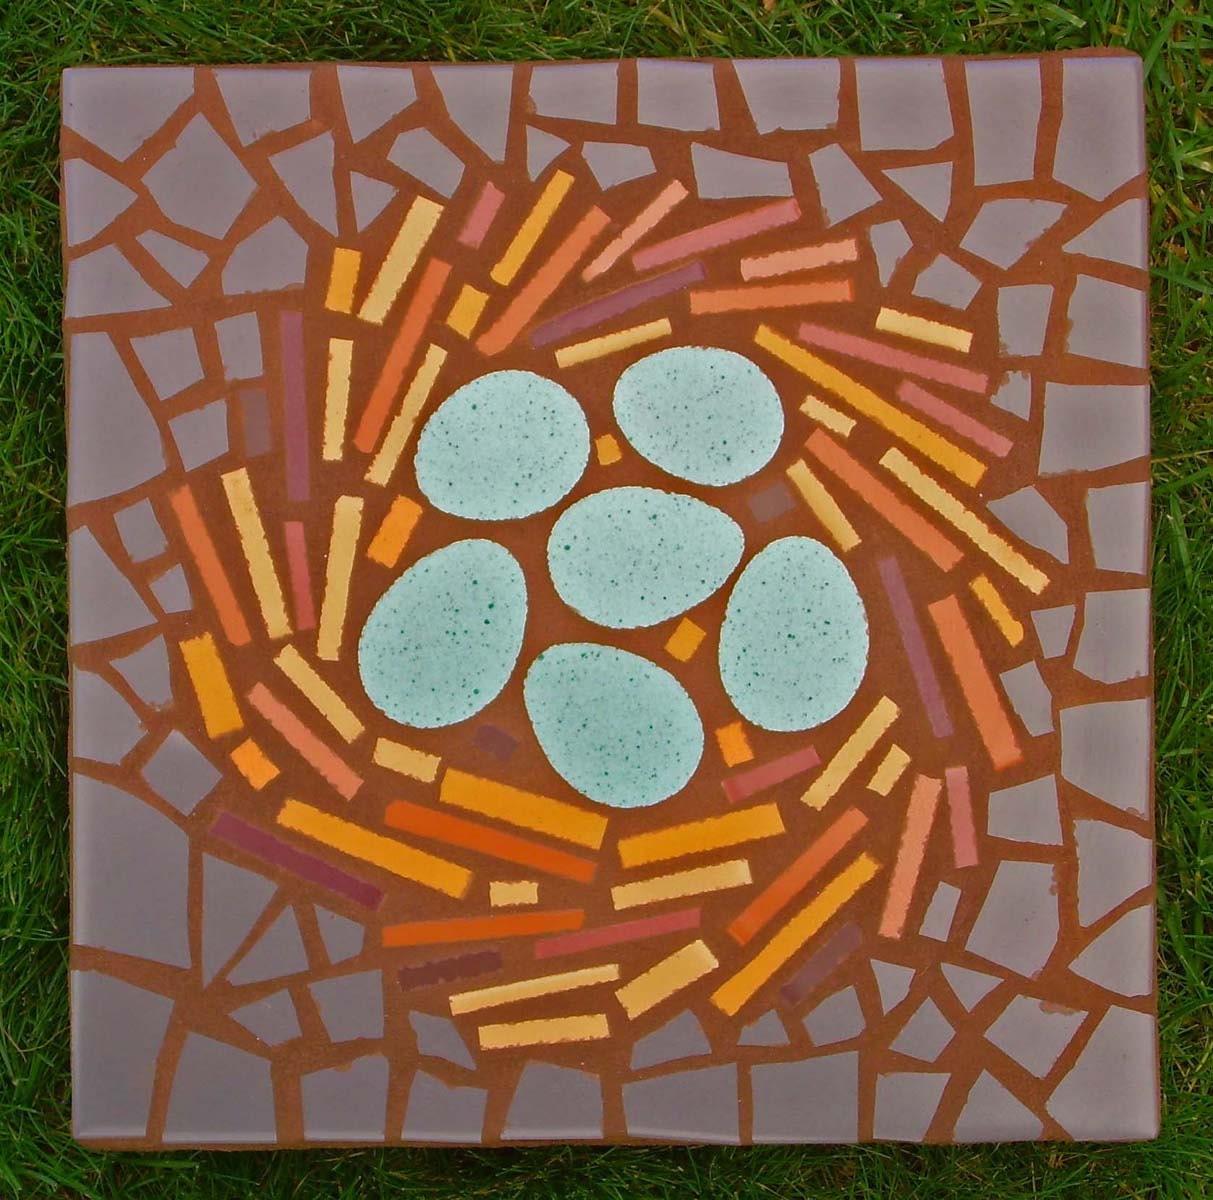 Mosaic Garden Stones: Exterior Garden Stepping Stone Mosaic Made To Order